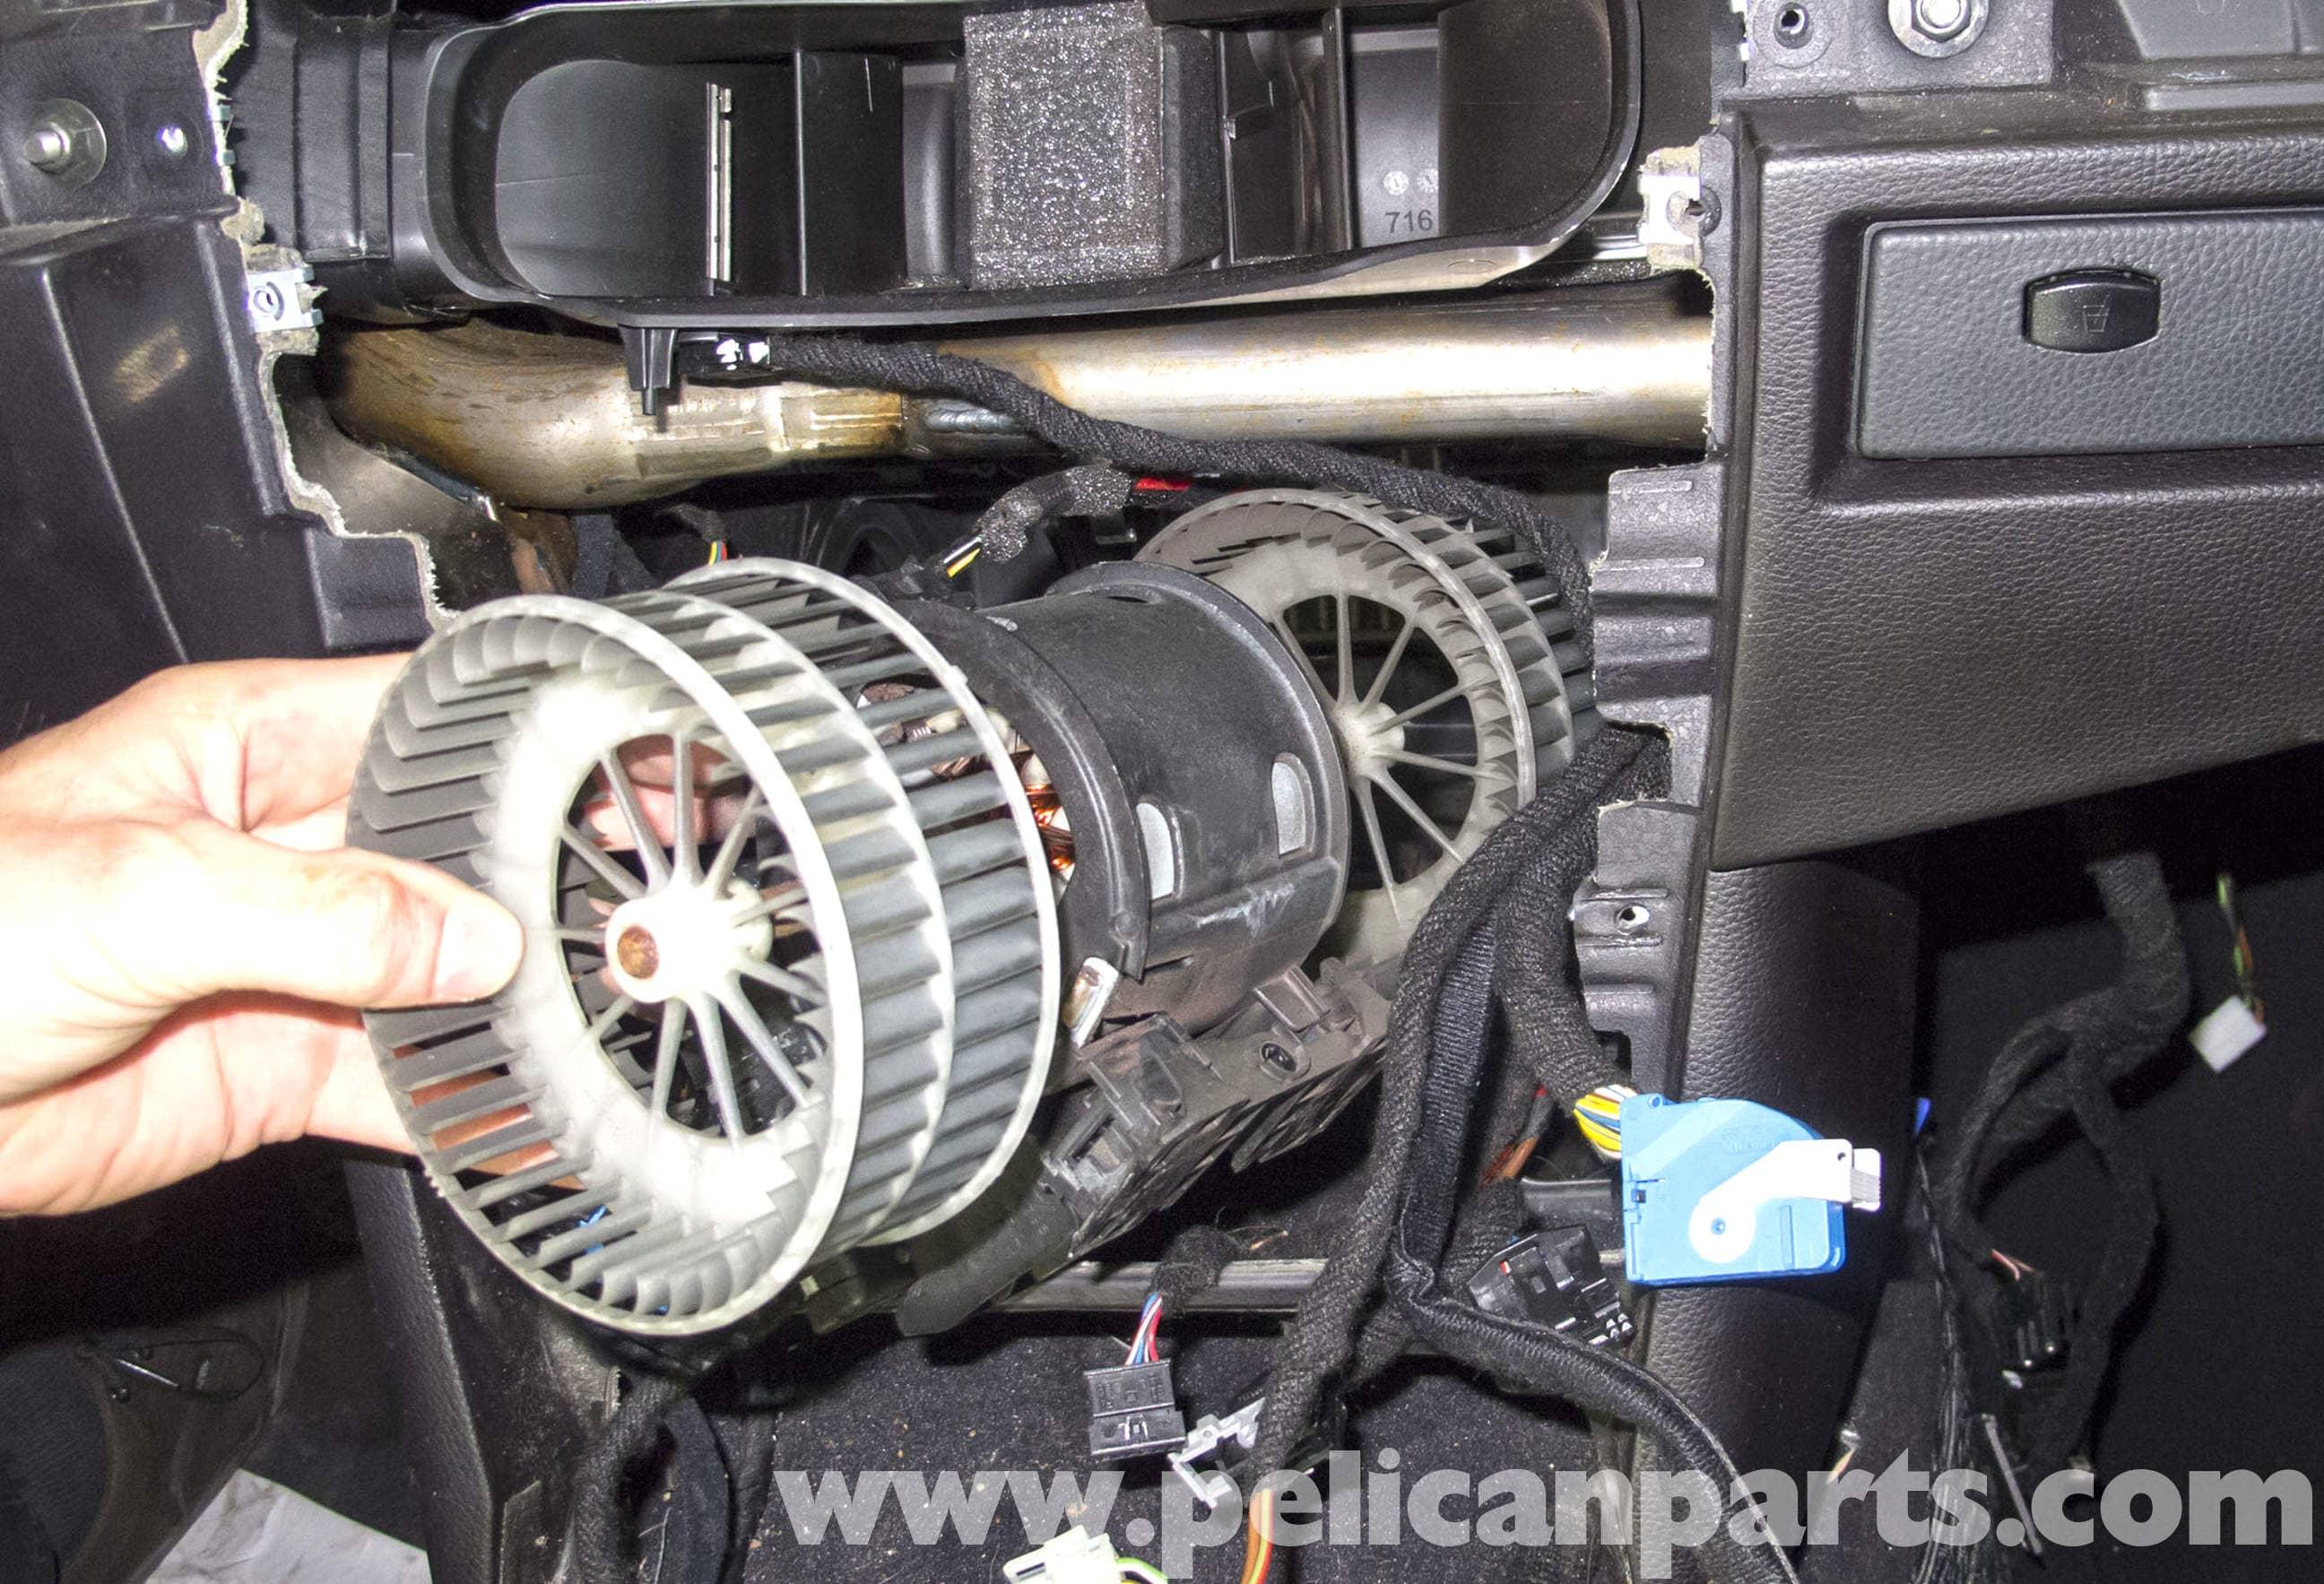 Amplifier Wiring Diagram Xi Bmw E60 5 Series Blower Motor Amp Blower Motor Resistor